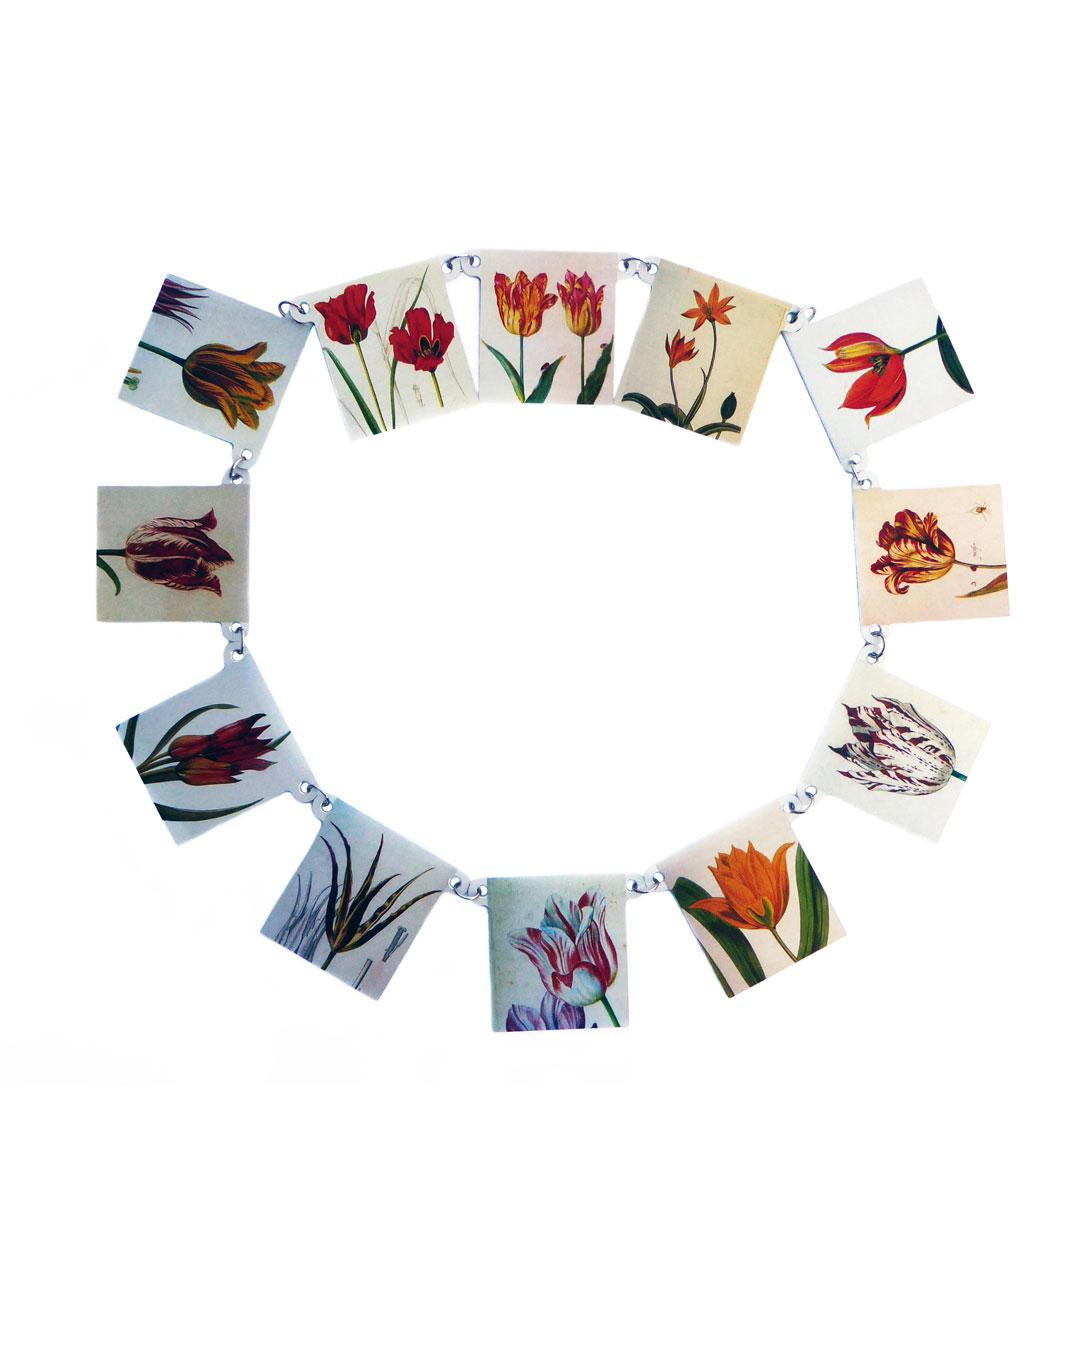 Herman Hermsen, Tulips from Amsterdam, 2019, necklace; print on aluminium, 278 x 5 mm, €850